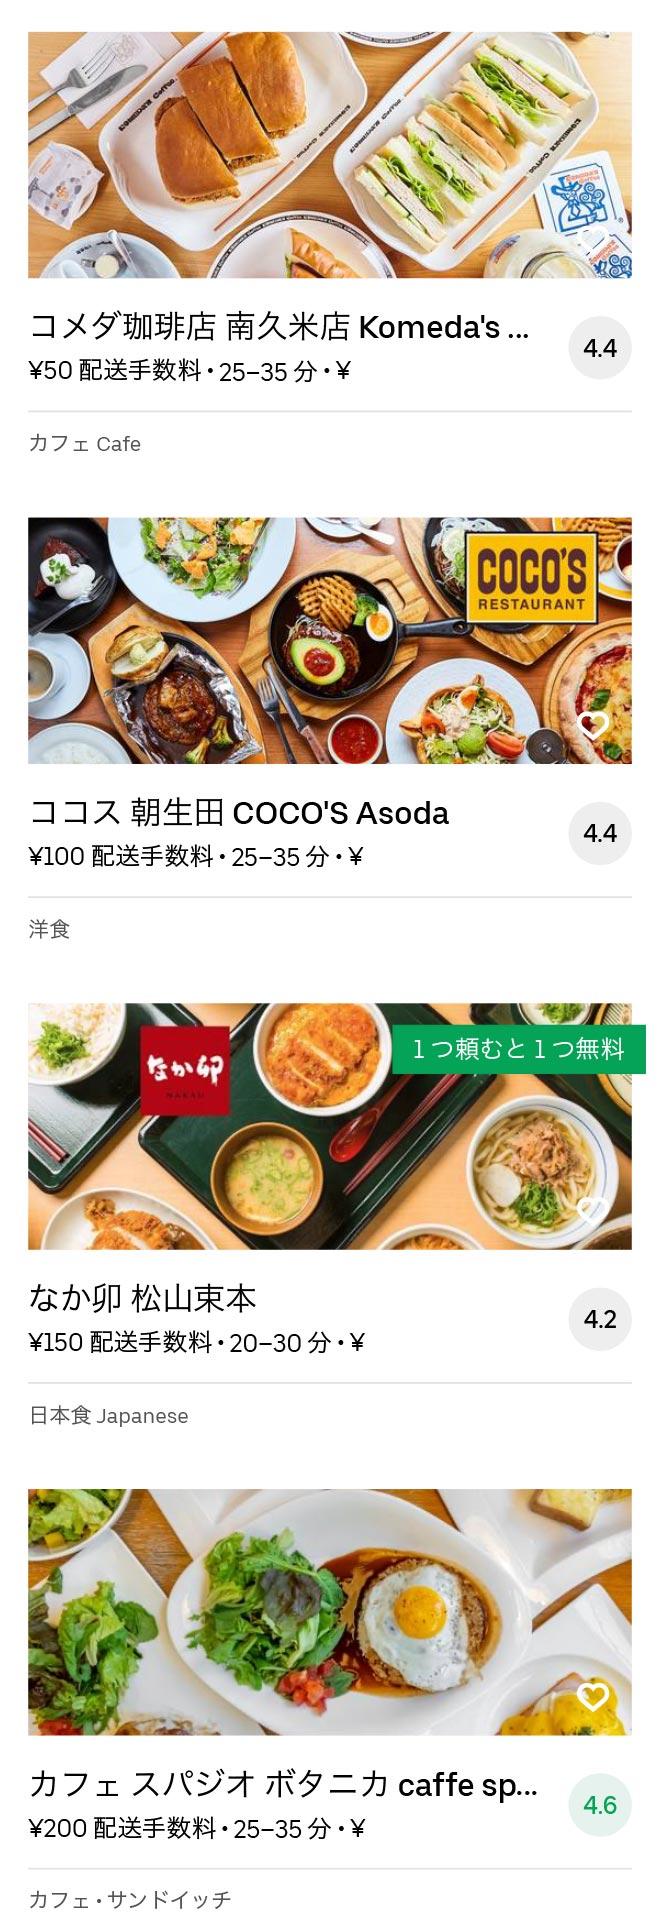 Kitakume menu 2010 06